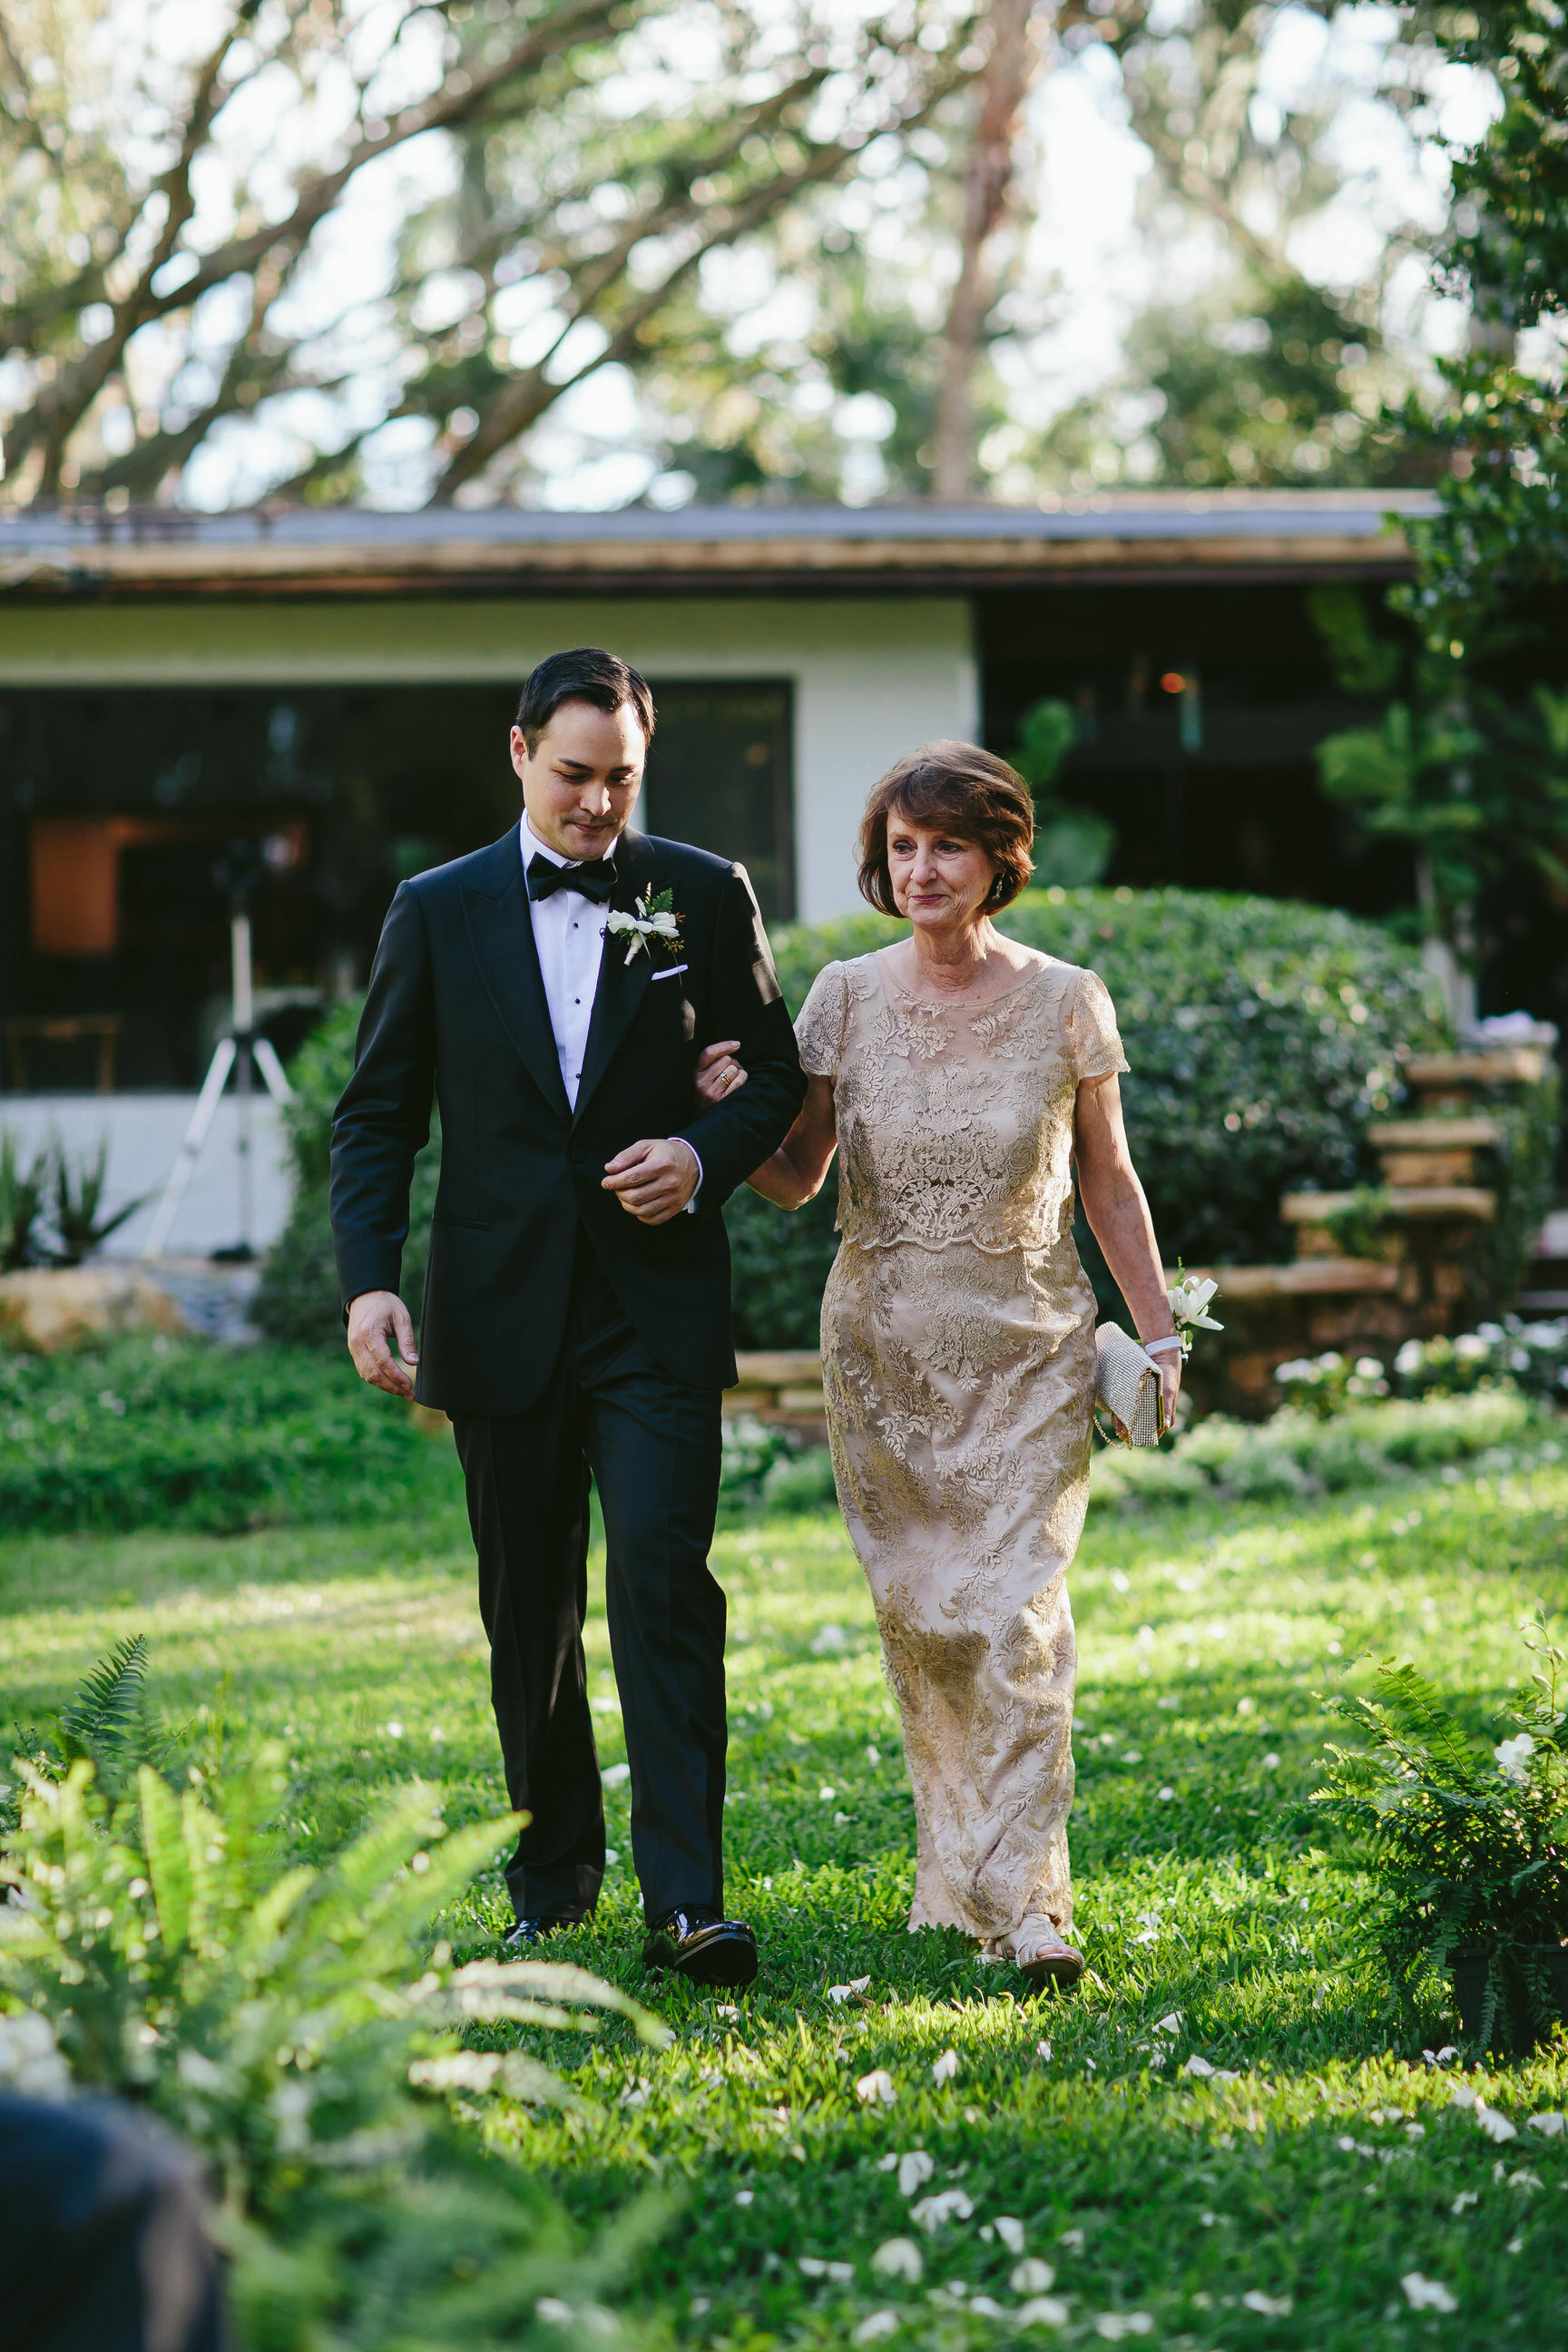 groom_processional_mog_wedding_backyard_twilight_inspired_tiny_house_photo.jpg